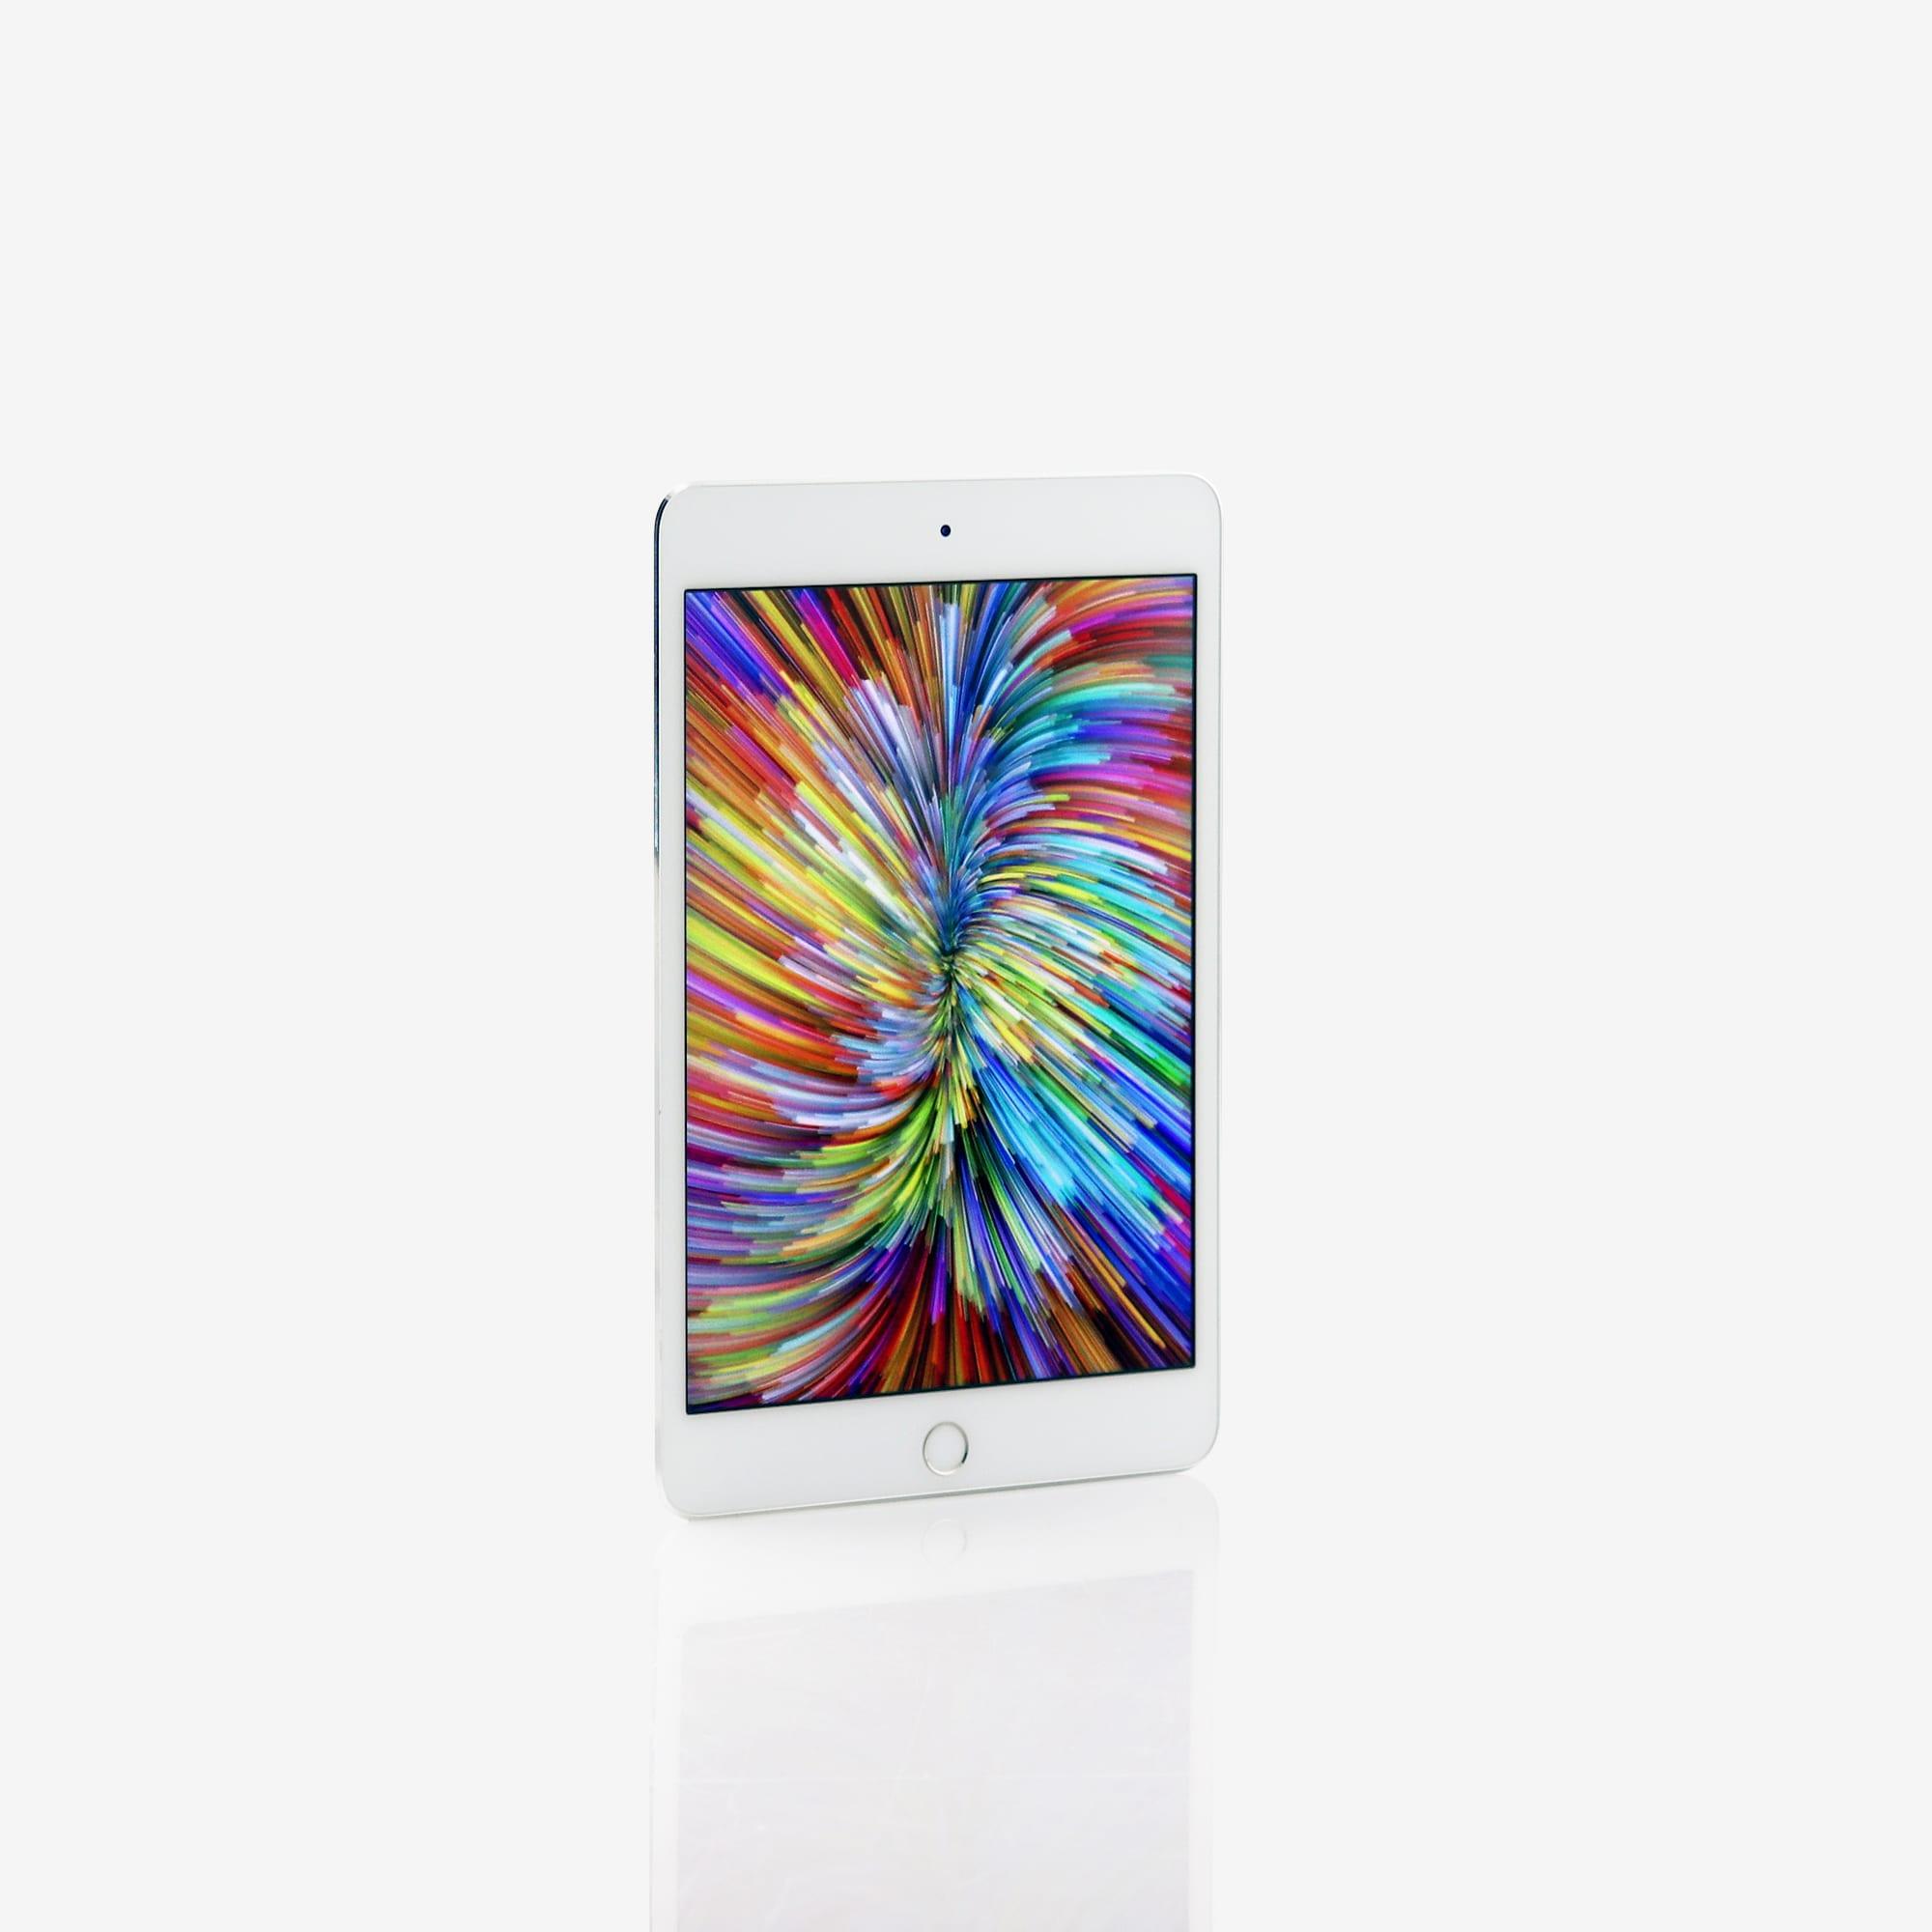 1 x iPad mini 4 (Wi-Fi) Silver